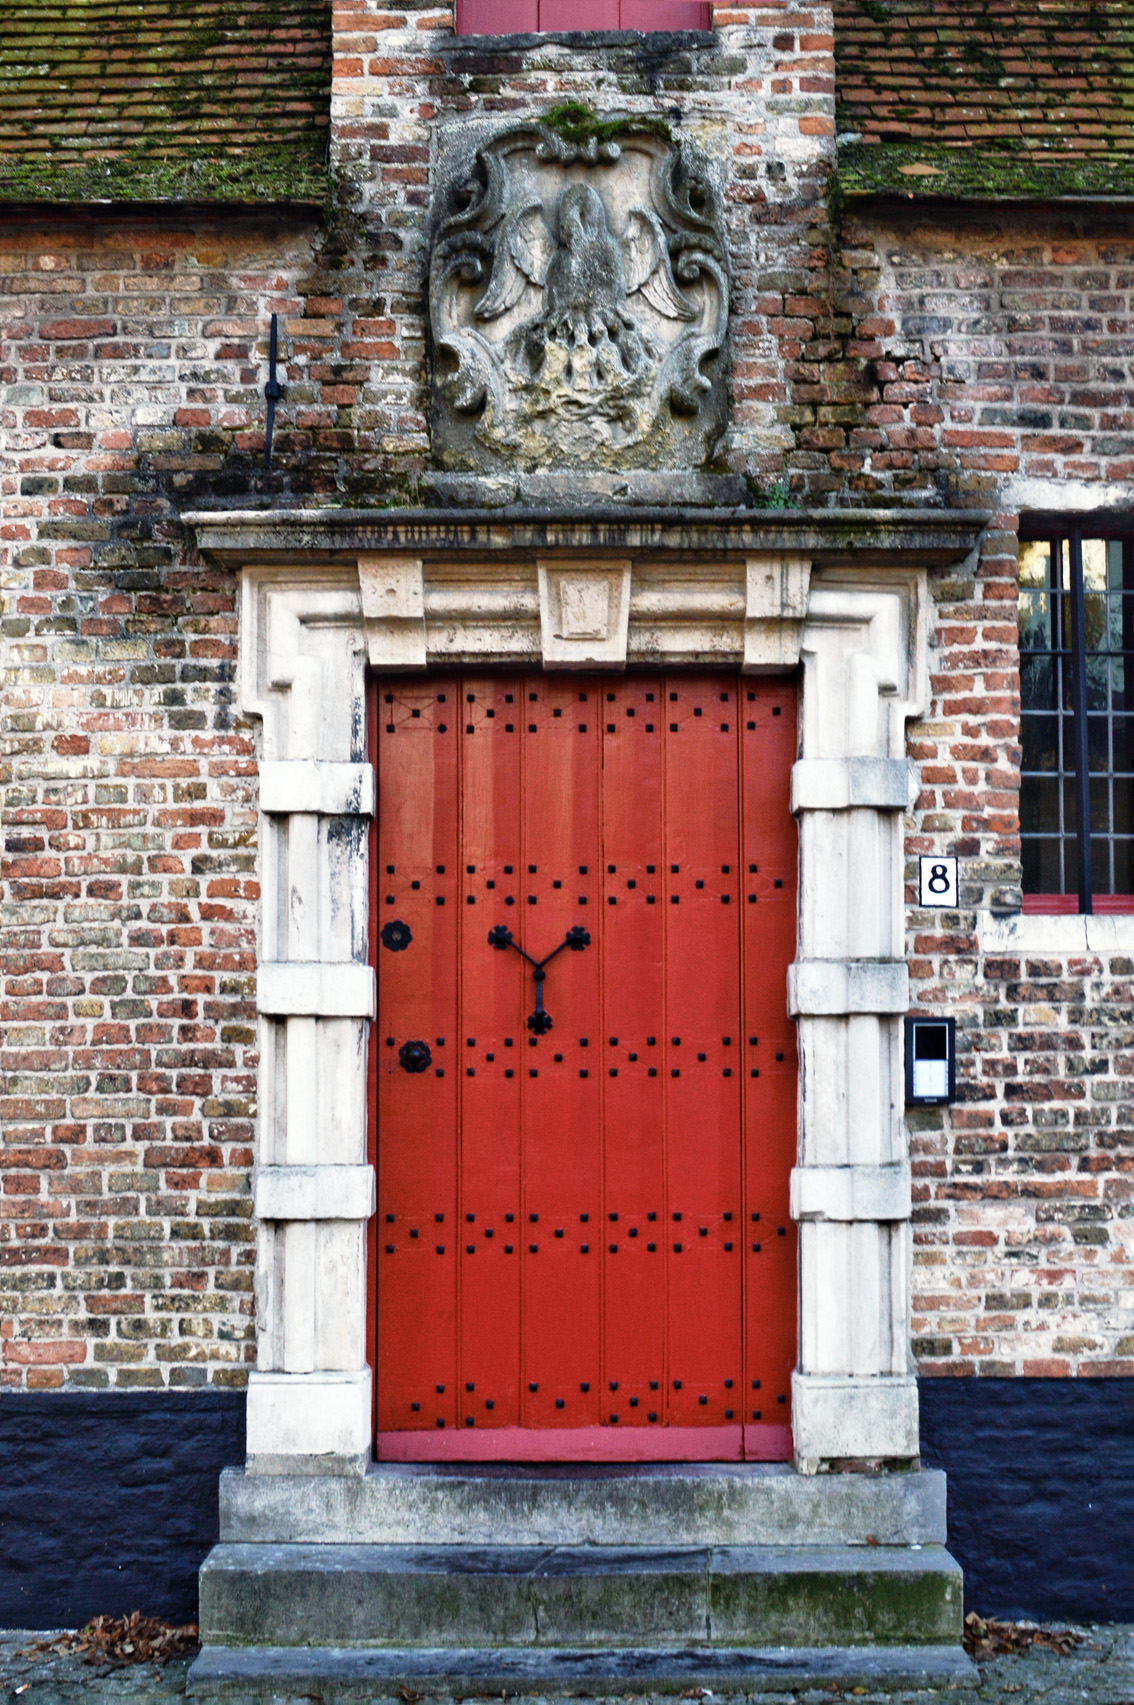 27-1 Un weekend in Belgio. Alla scoperta delle Fiandre: Bruges .